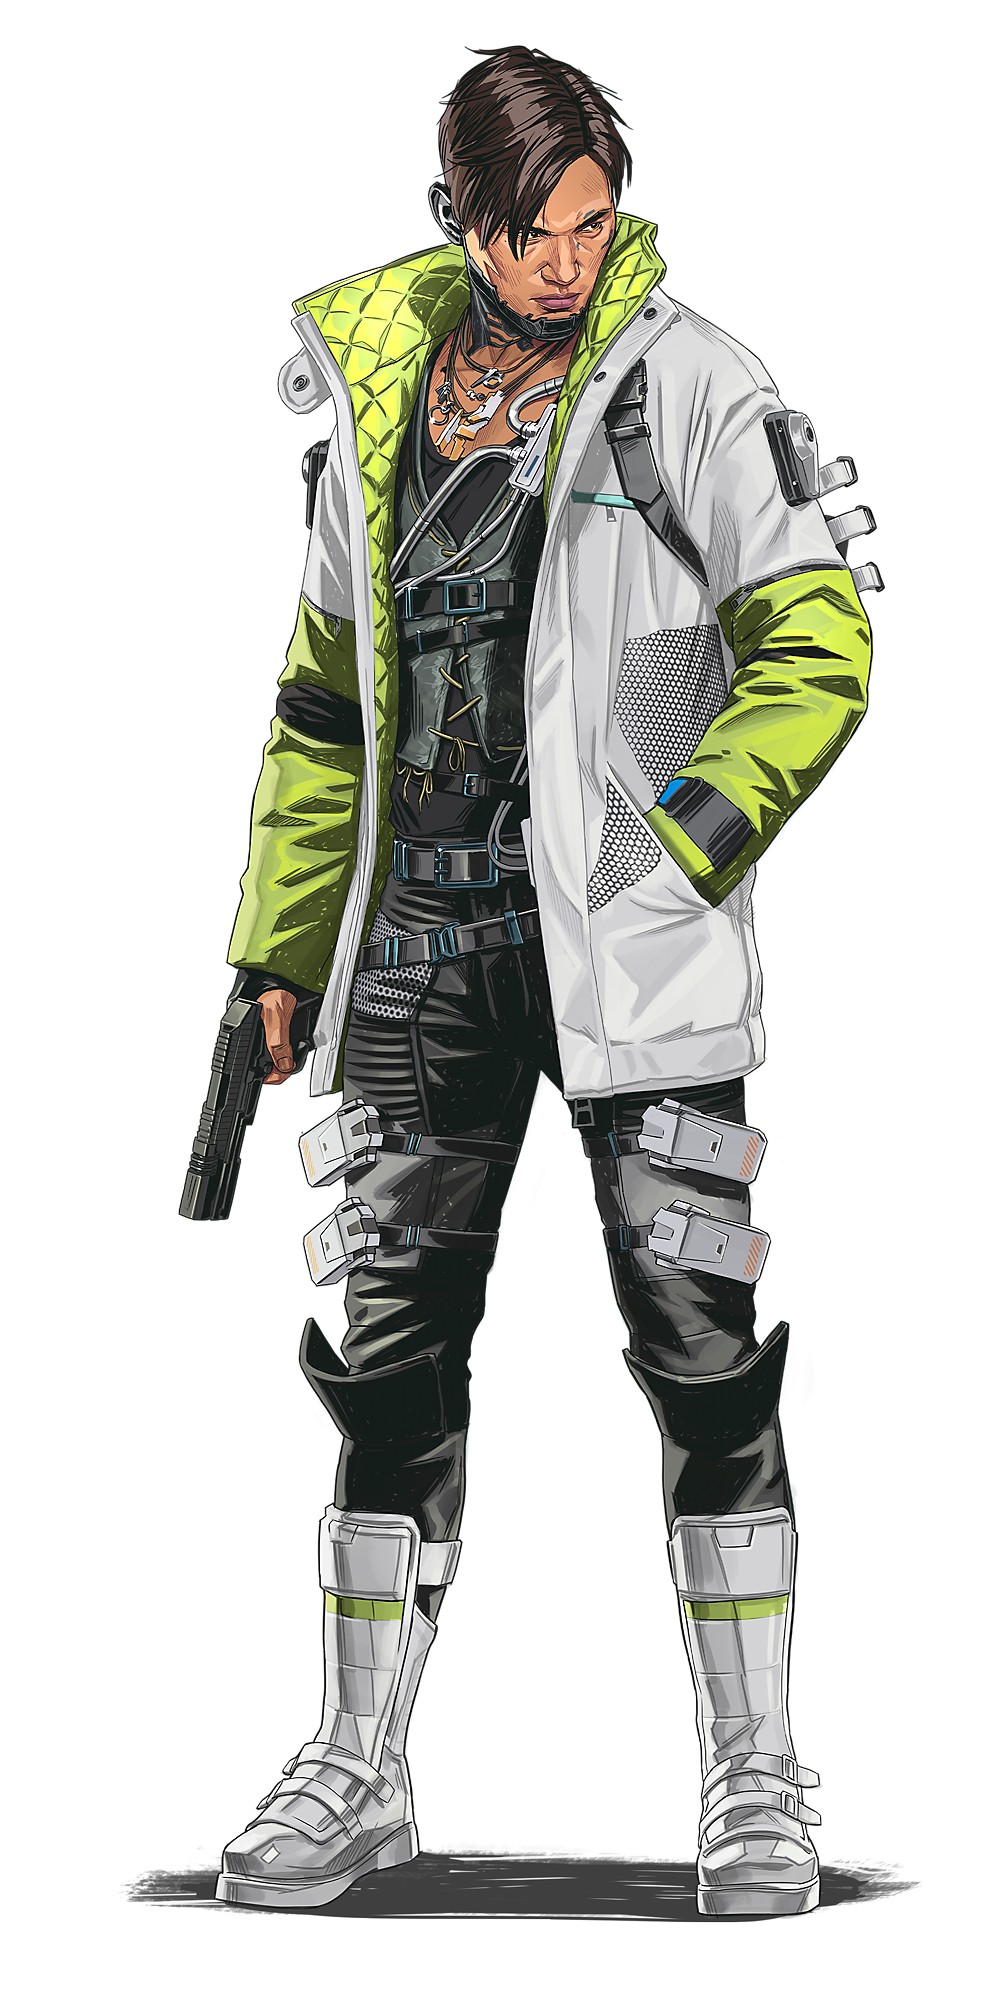 Crypto Apex Legends Jacket Video Game Jacket Crypto Apex Legends Character Design Cyberpunk Character